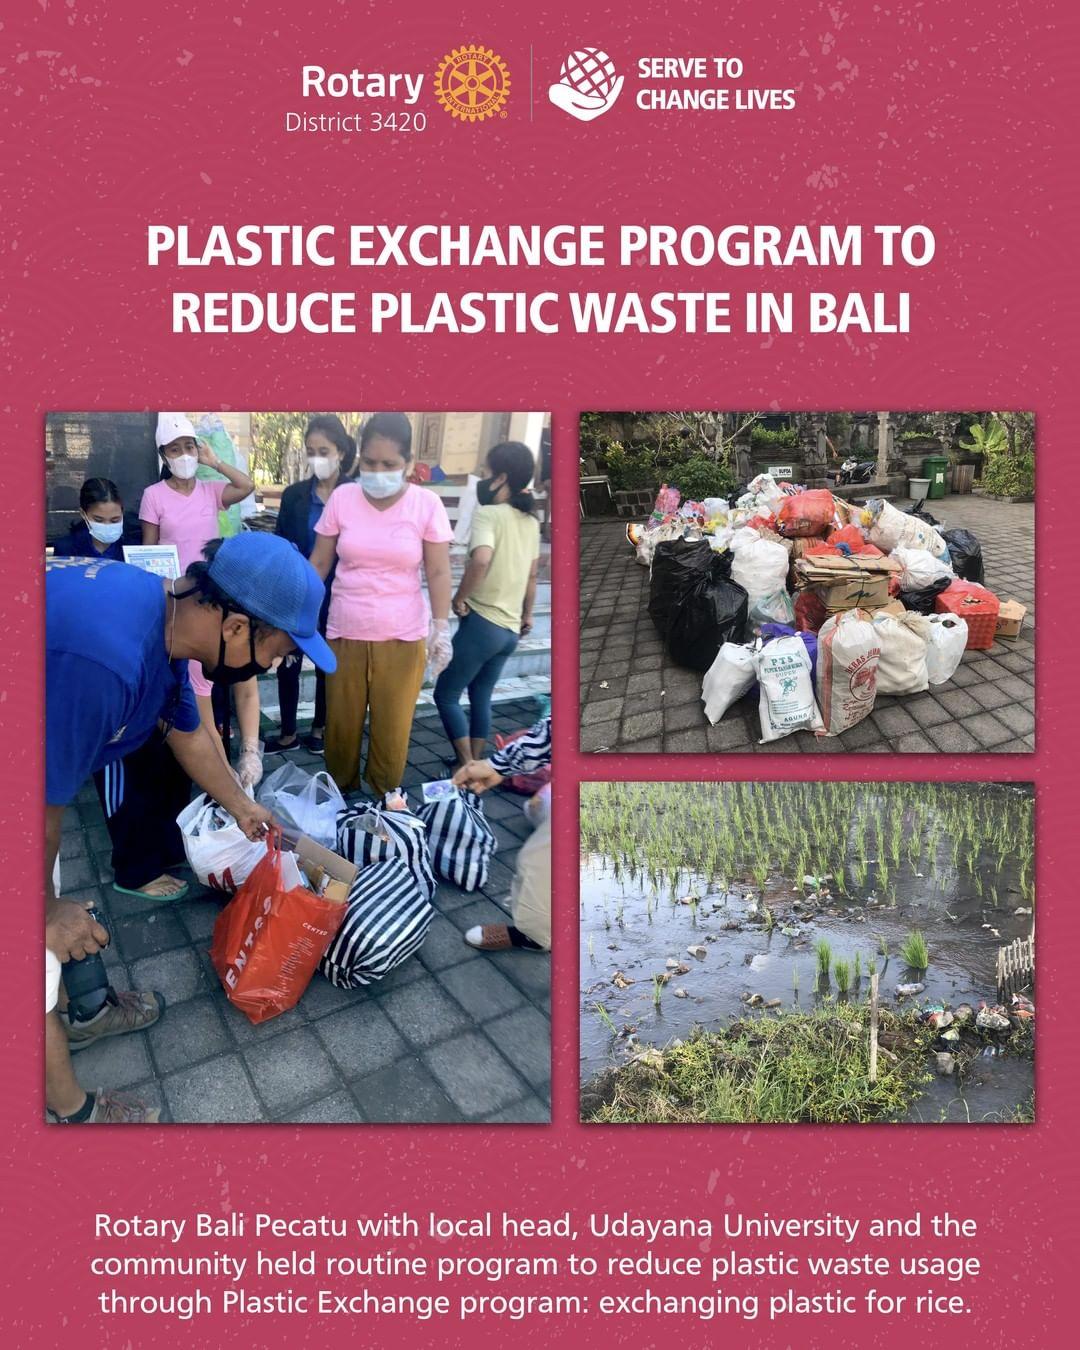 Plastic Exchange Program to Reduce Plastic Waste in Bali